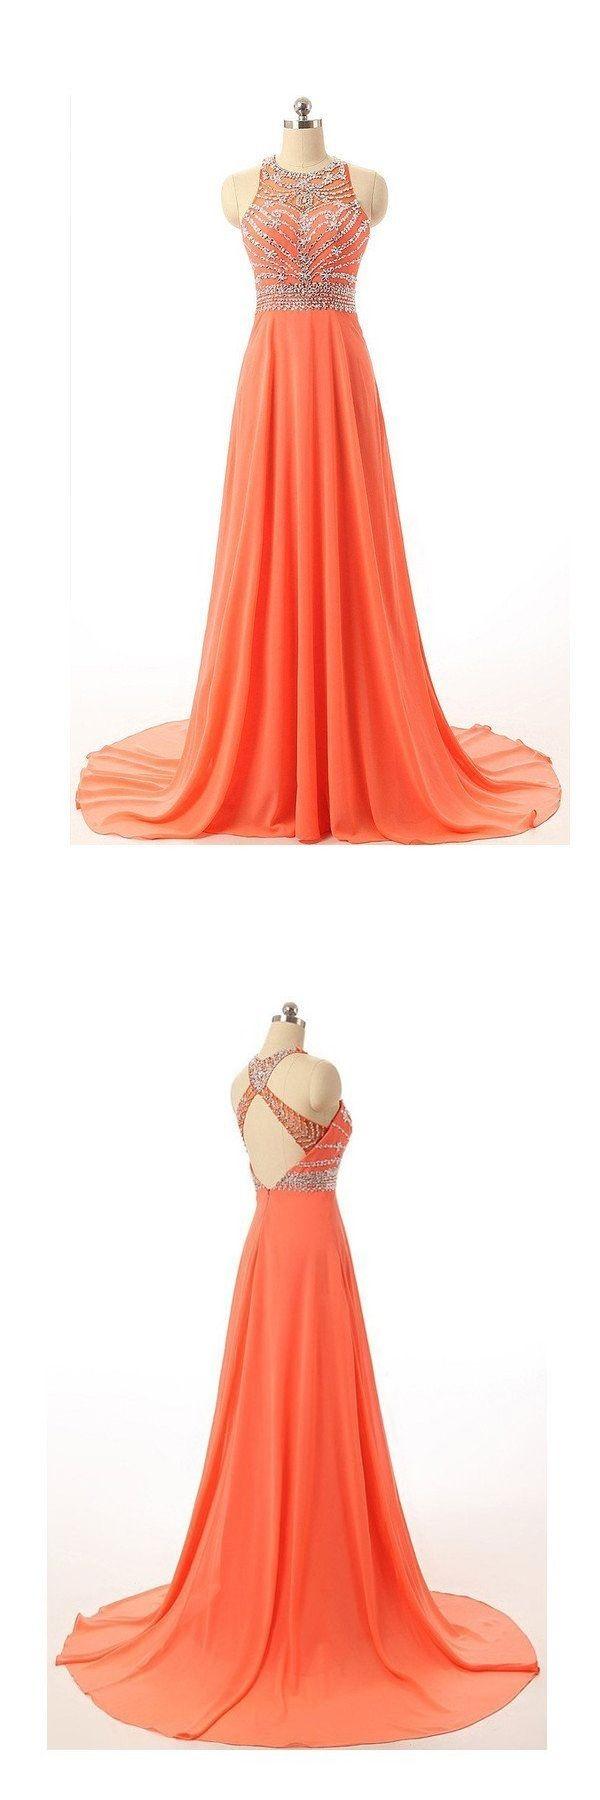 best homecoming dresses images on pinterest short prom dresses